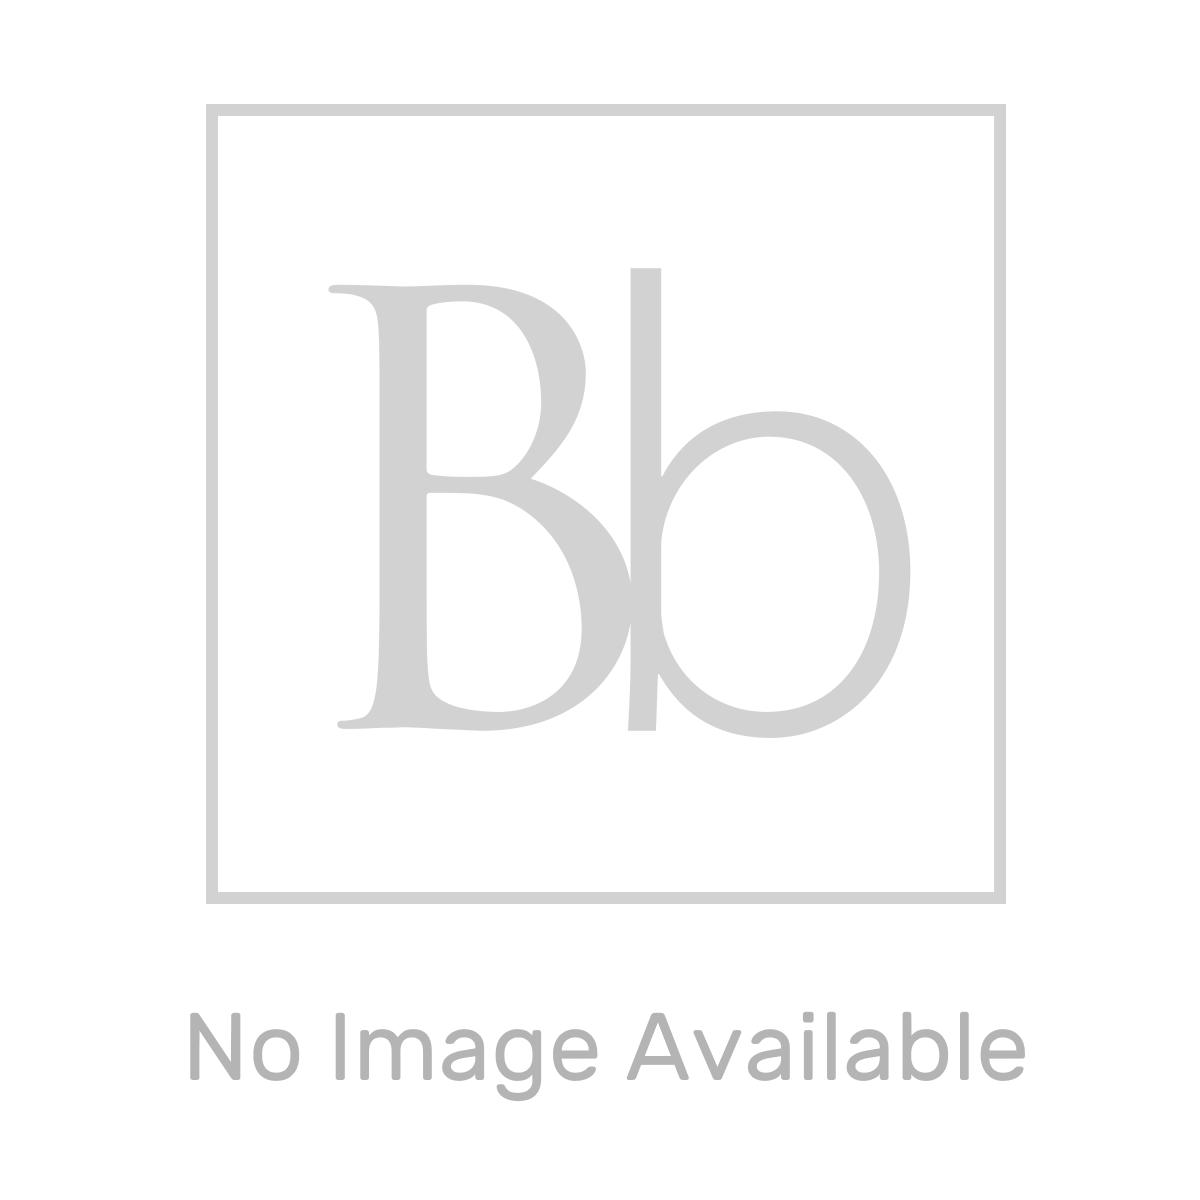 RAK Series 600 Basin and Full Pedestal 520mm Lifestyle